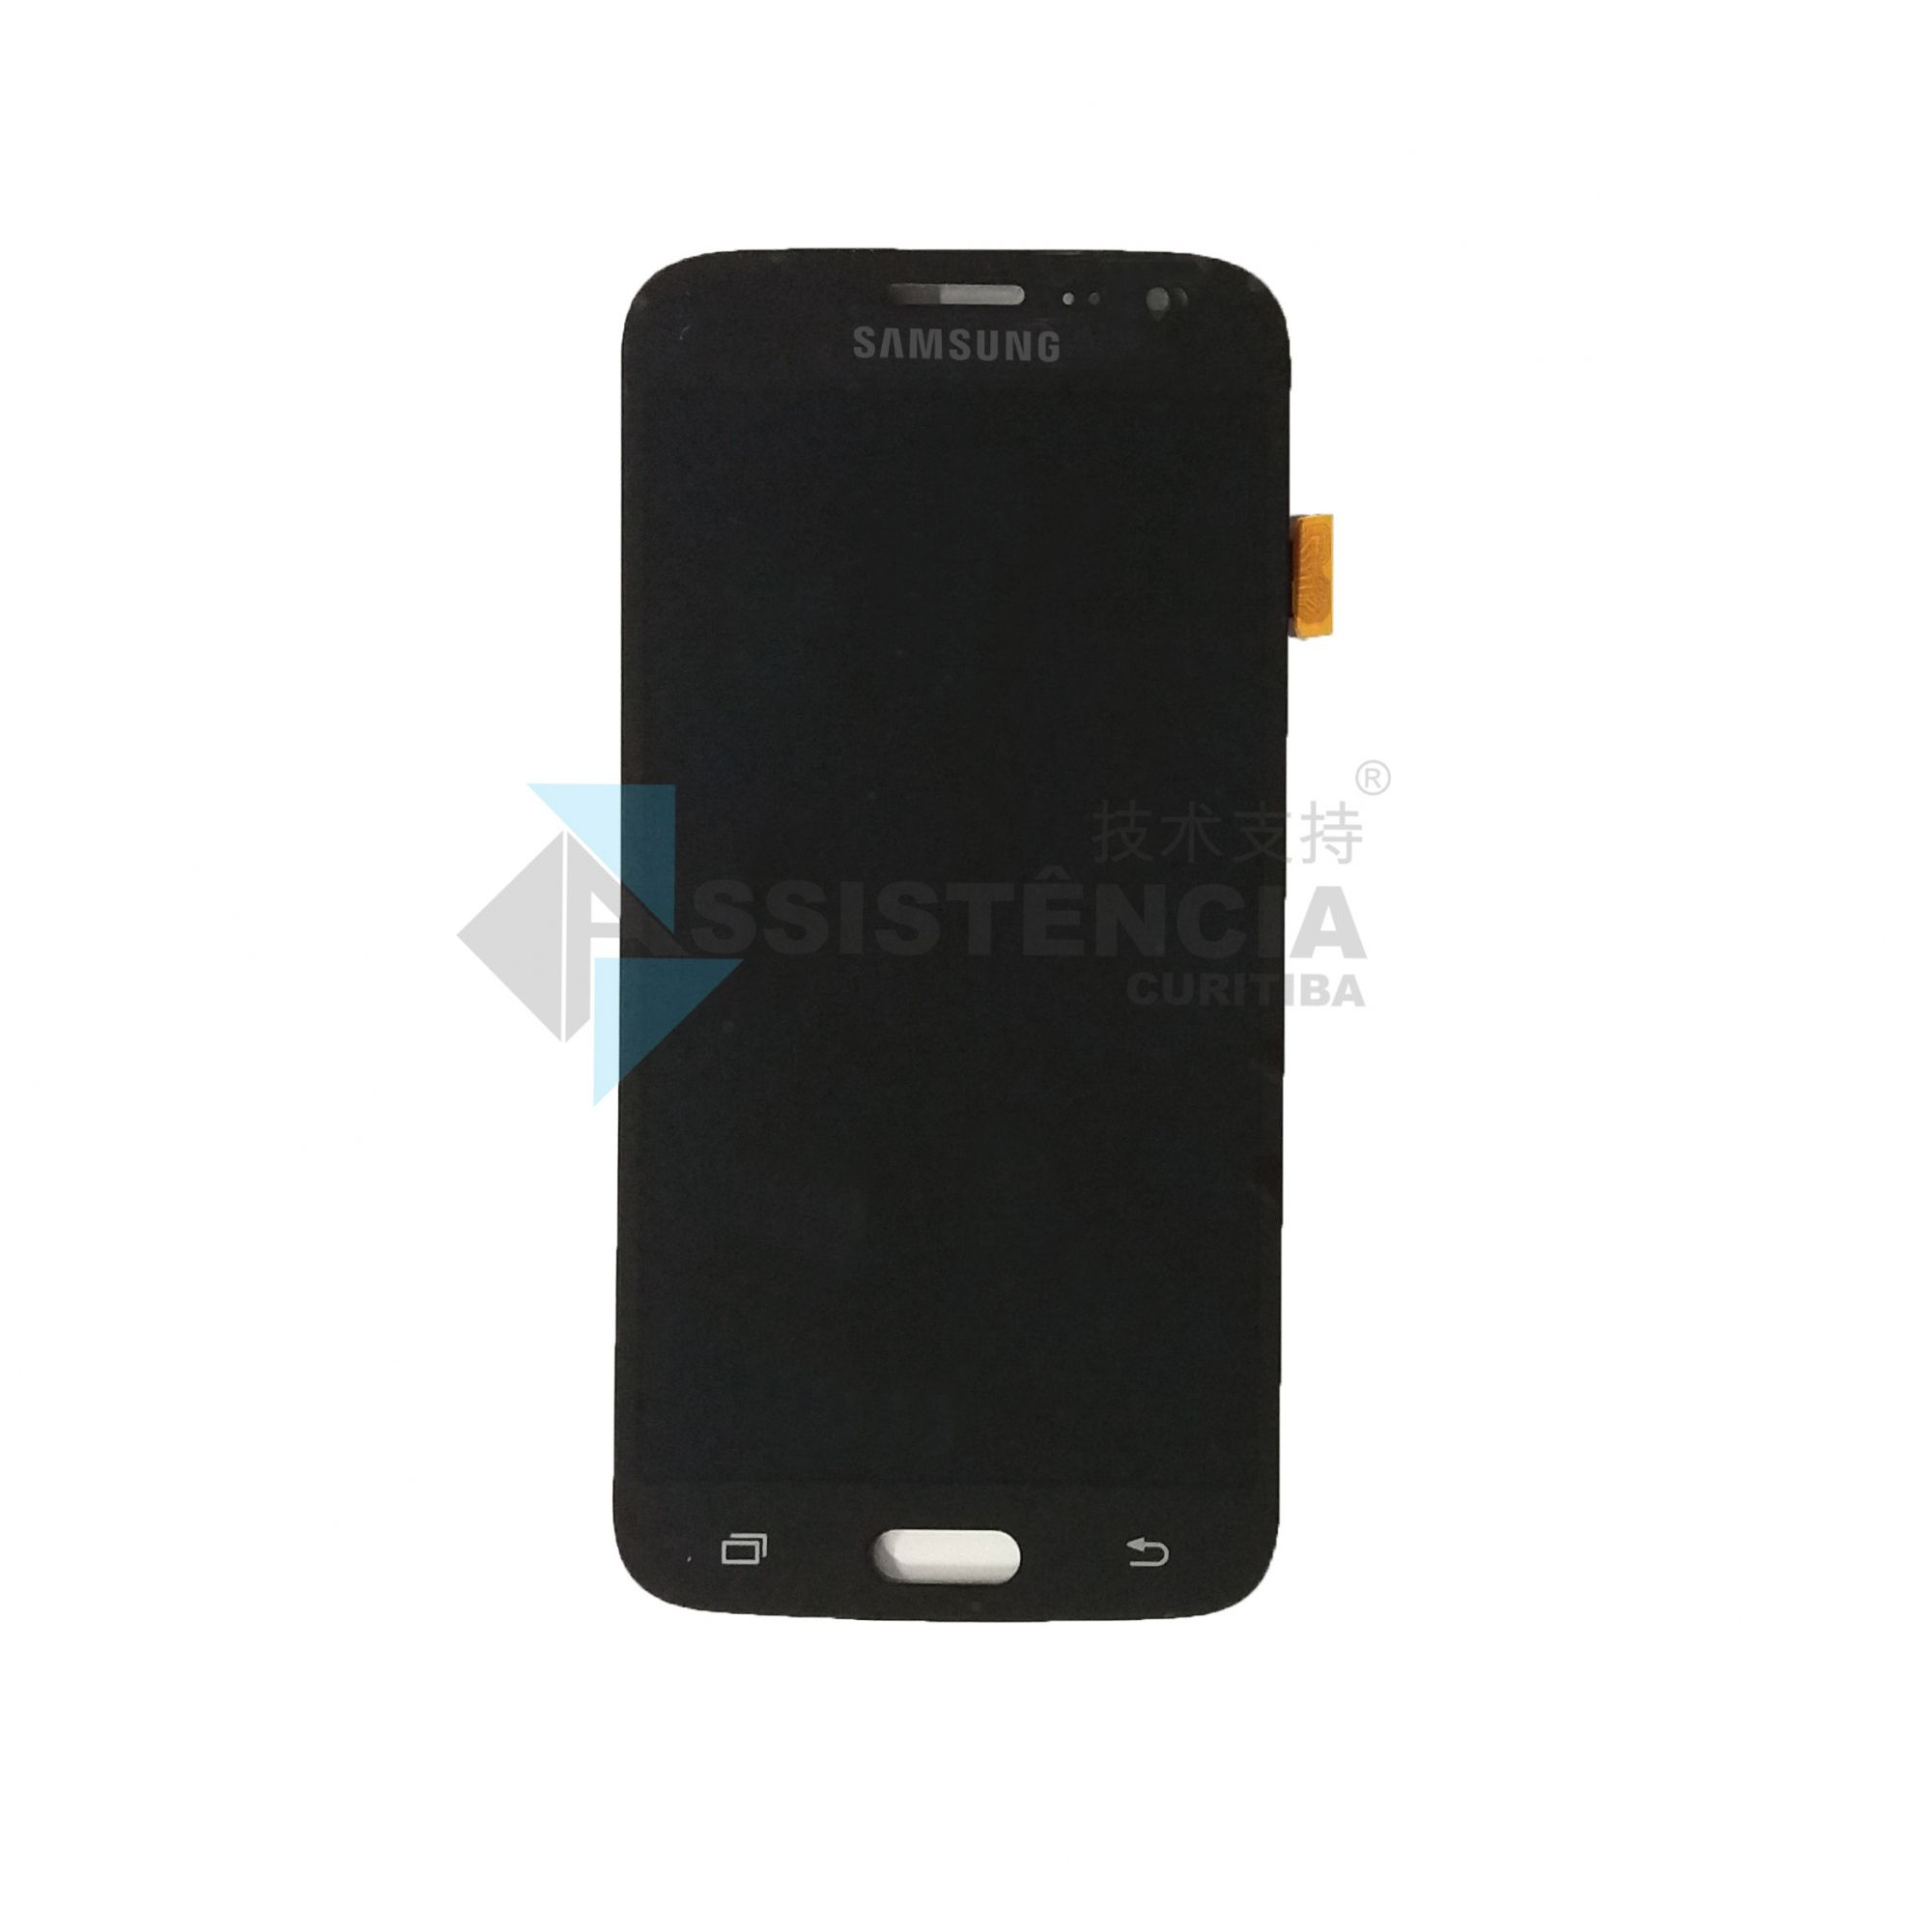 Tela Display Samsung Galaxy J2 2016 J210 Sm-J210 Com Brilho Preto